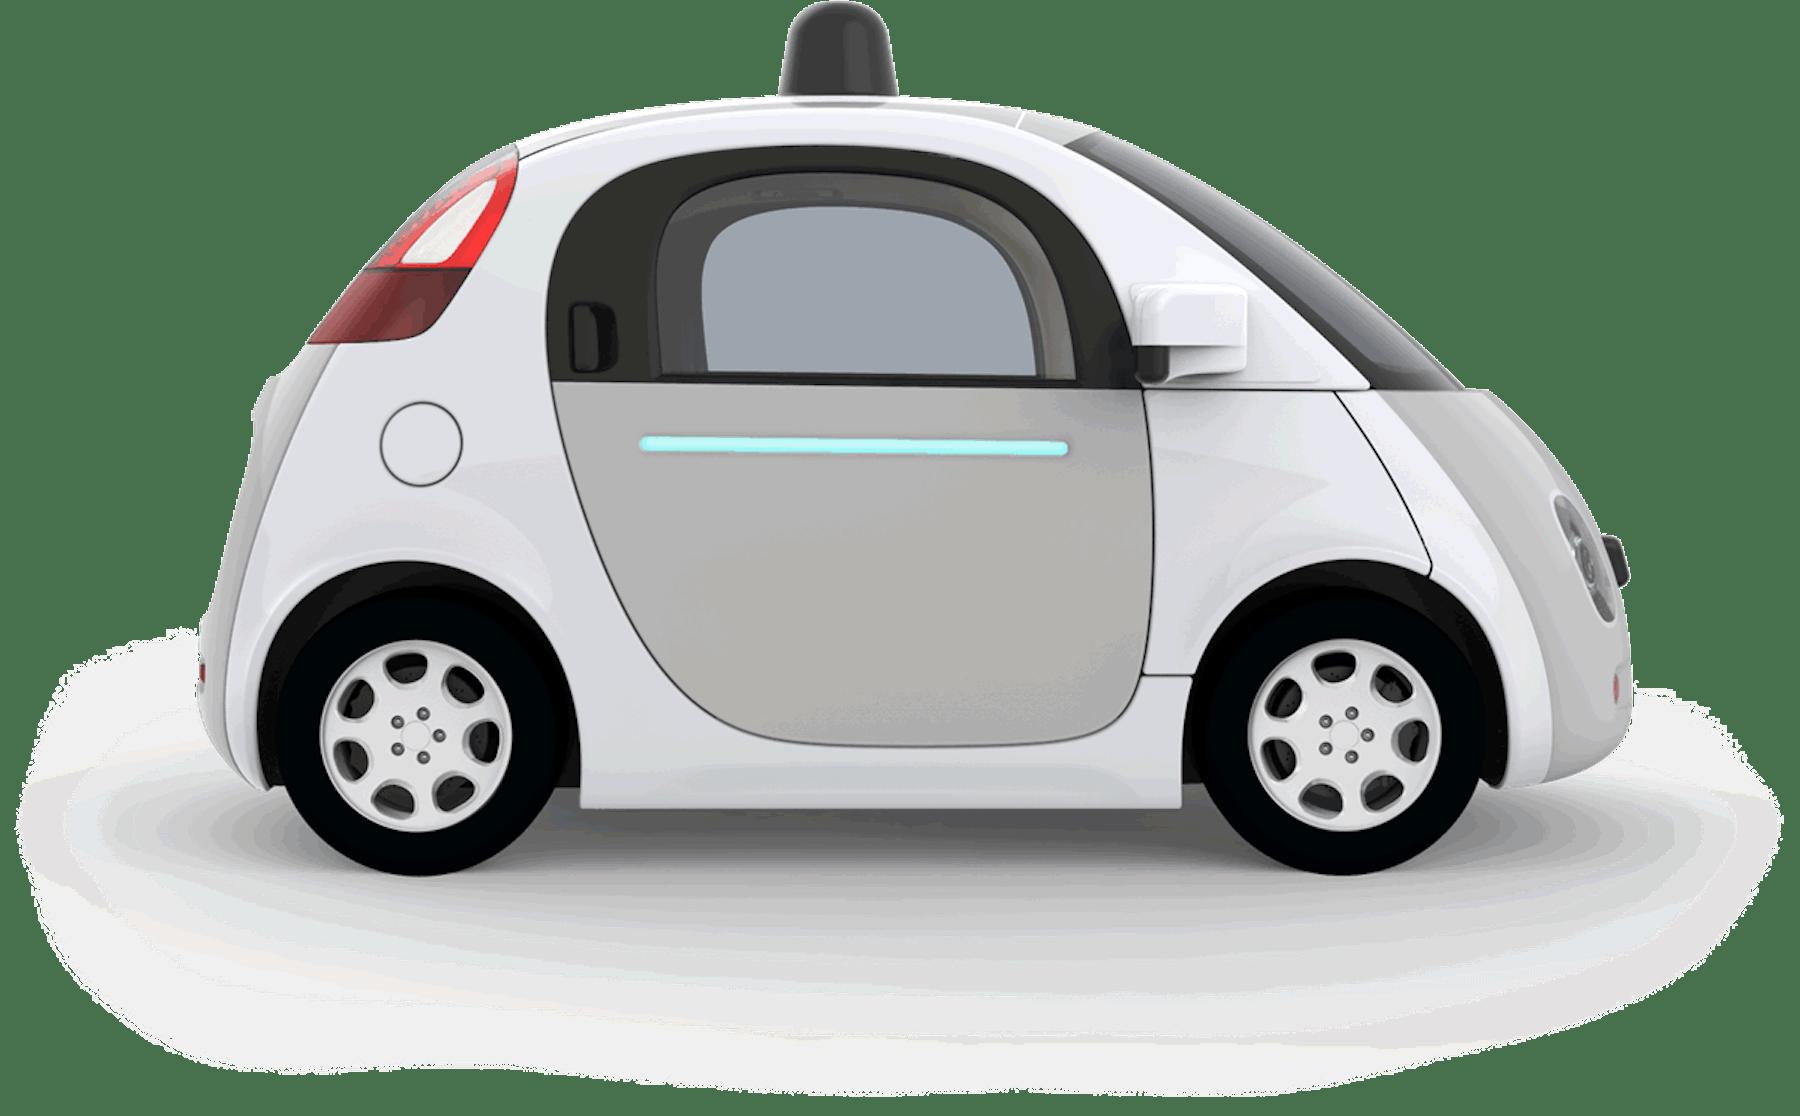 Google's self-driving prototype.